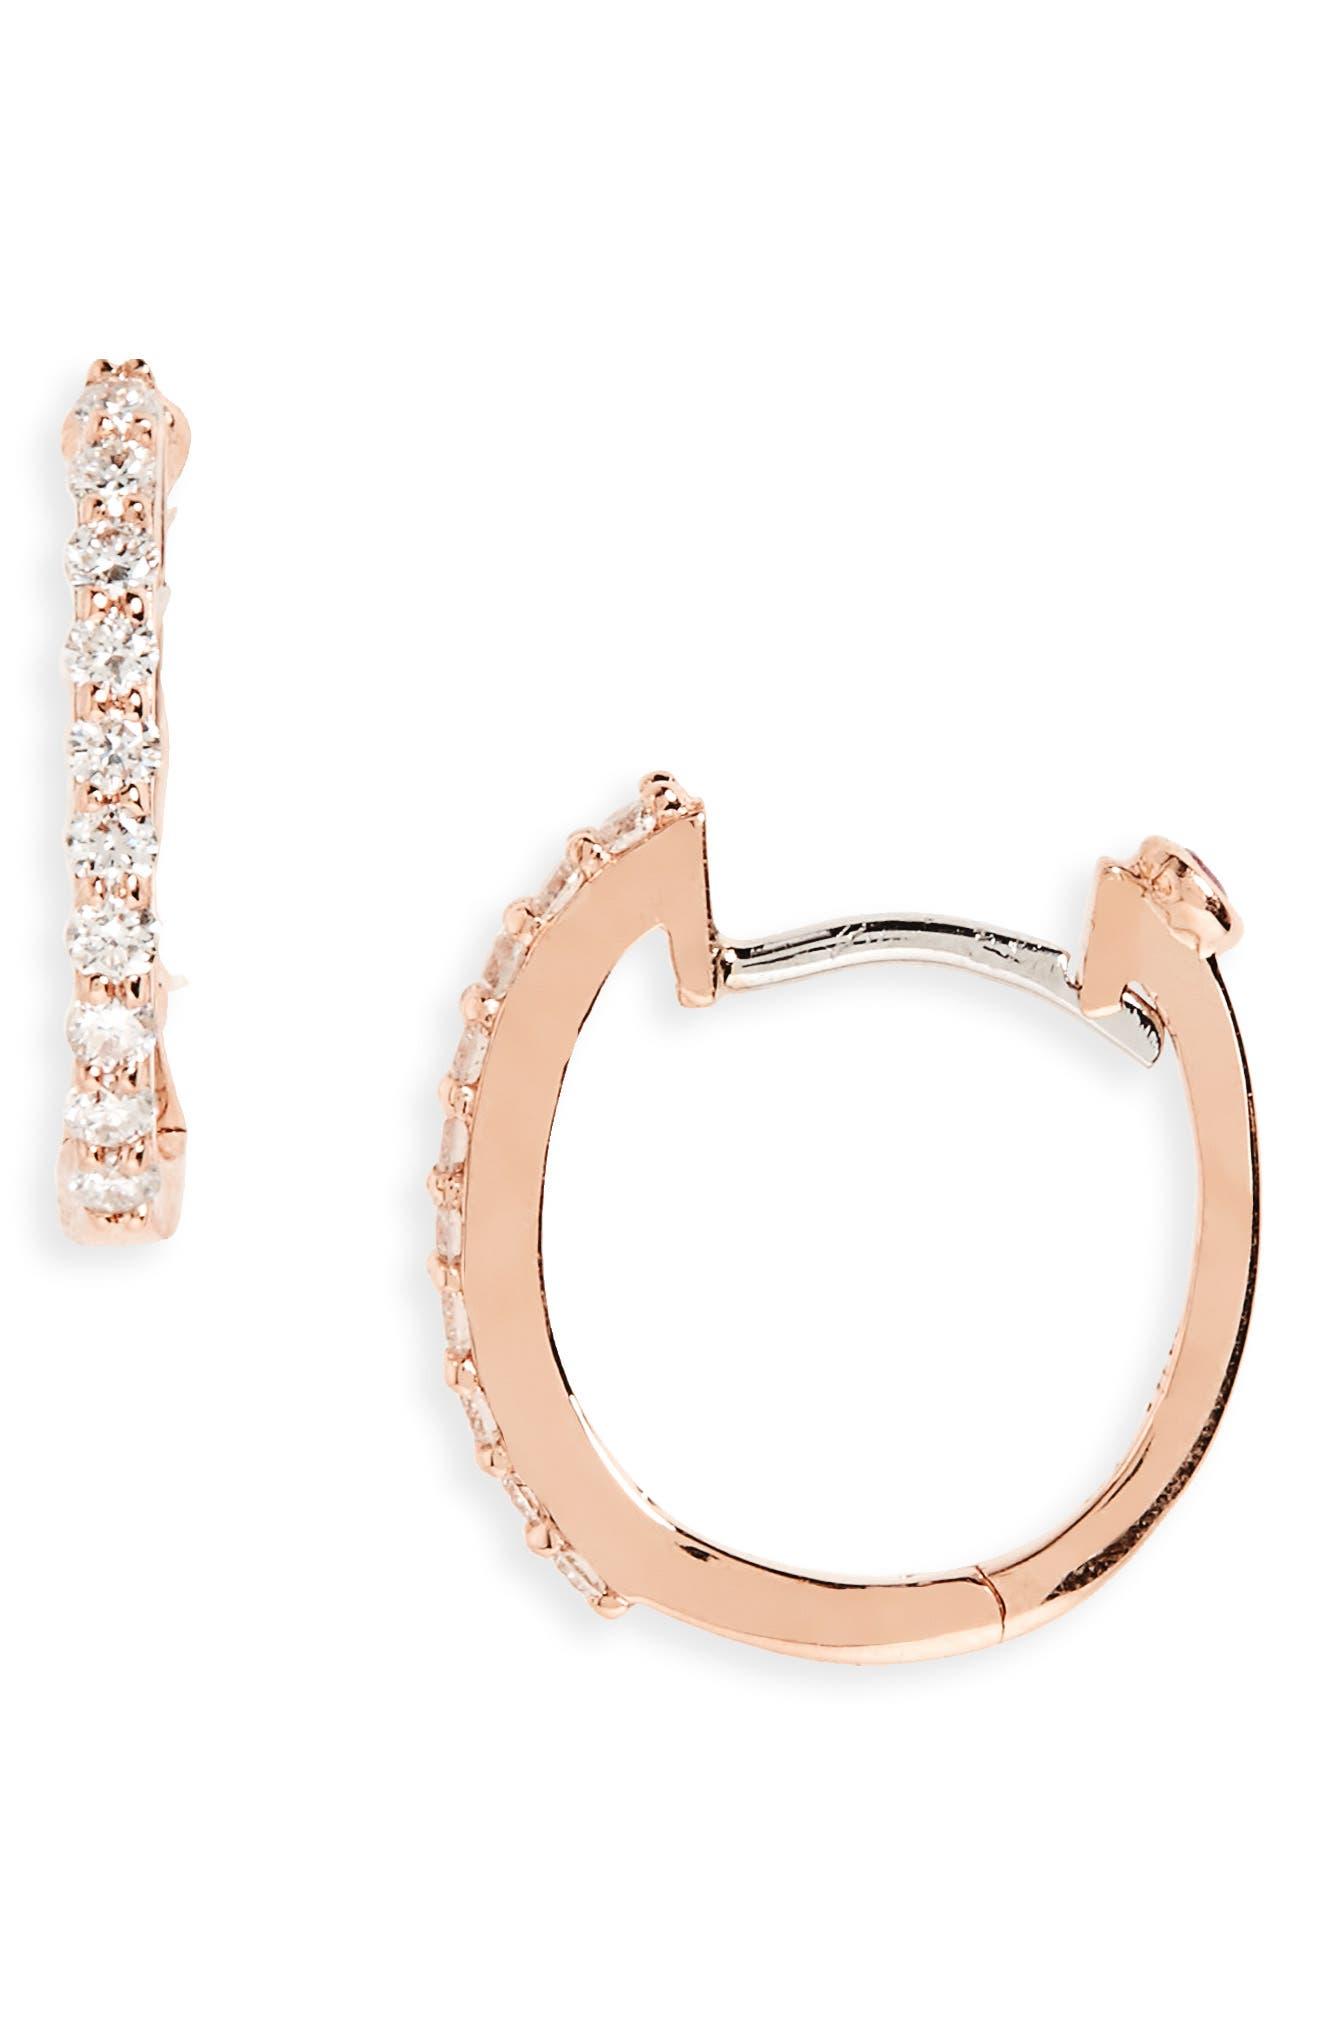 Small Diamond Hoop Earrings,                             Main thumbnail 1, color,                             Rose Rold